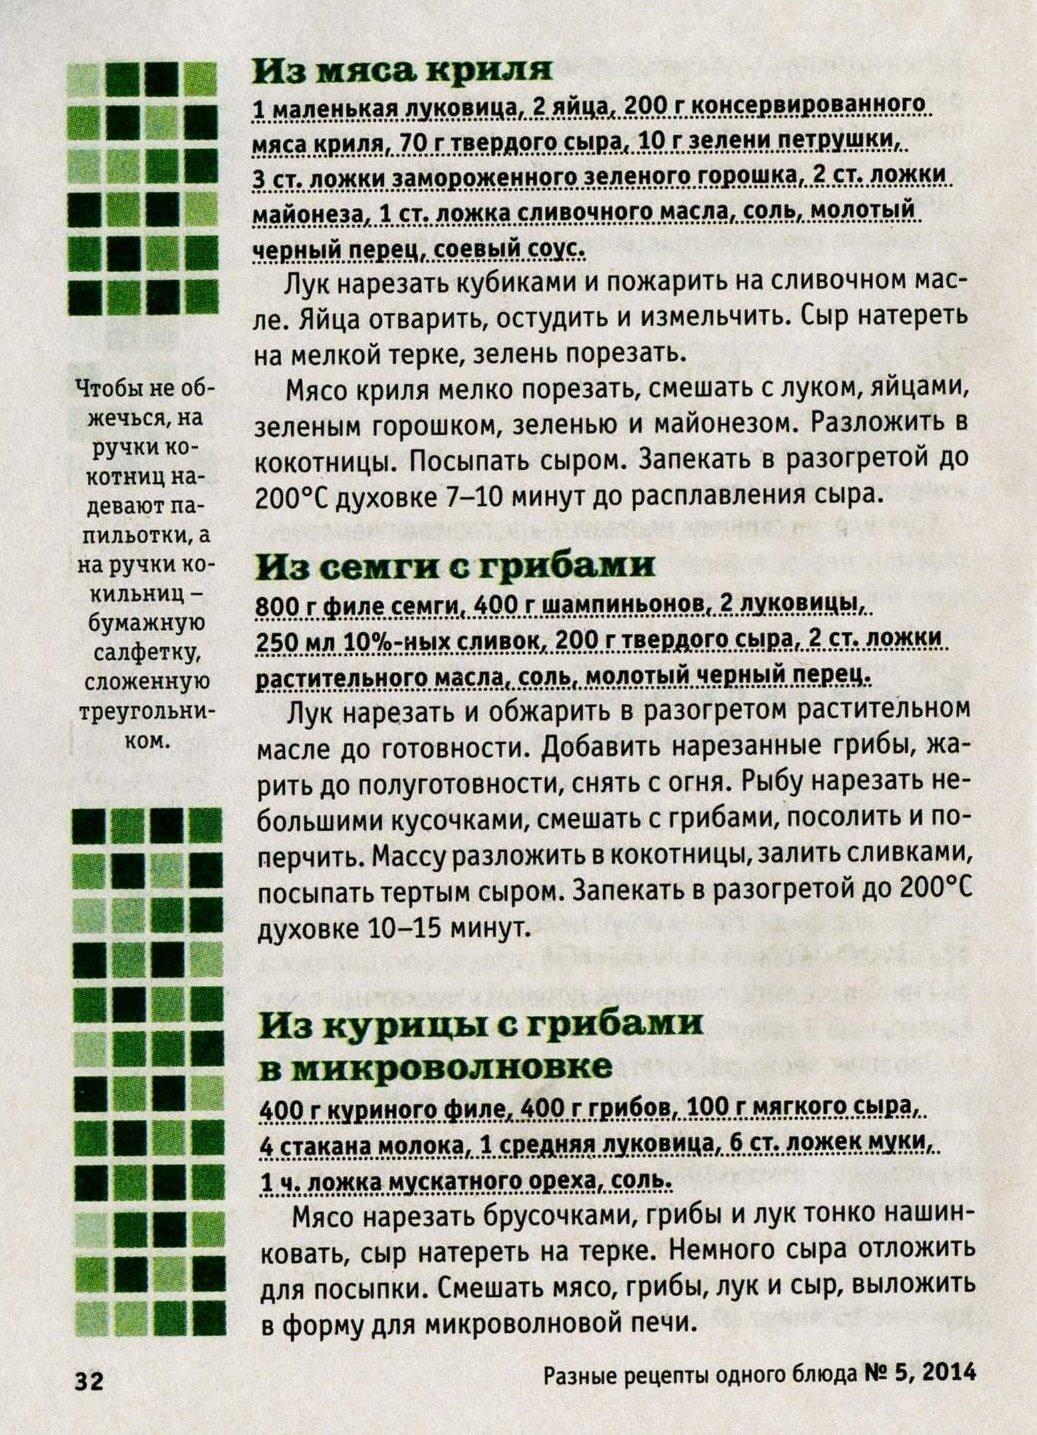 http://images.vfl.ru/ii/1406913608/fb3f296a/5869851.jpg